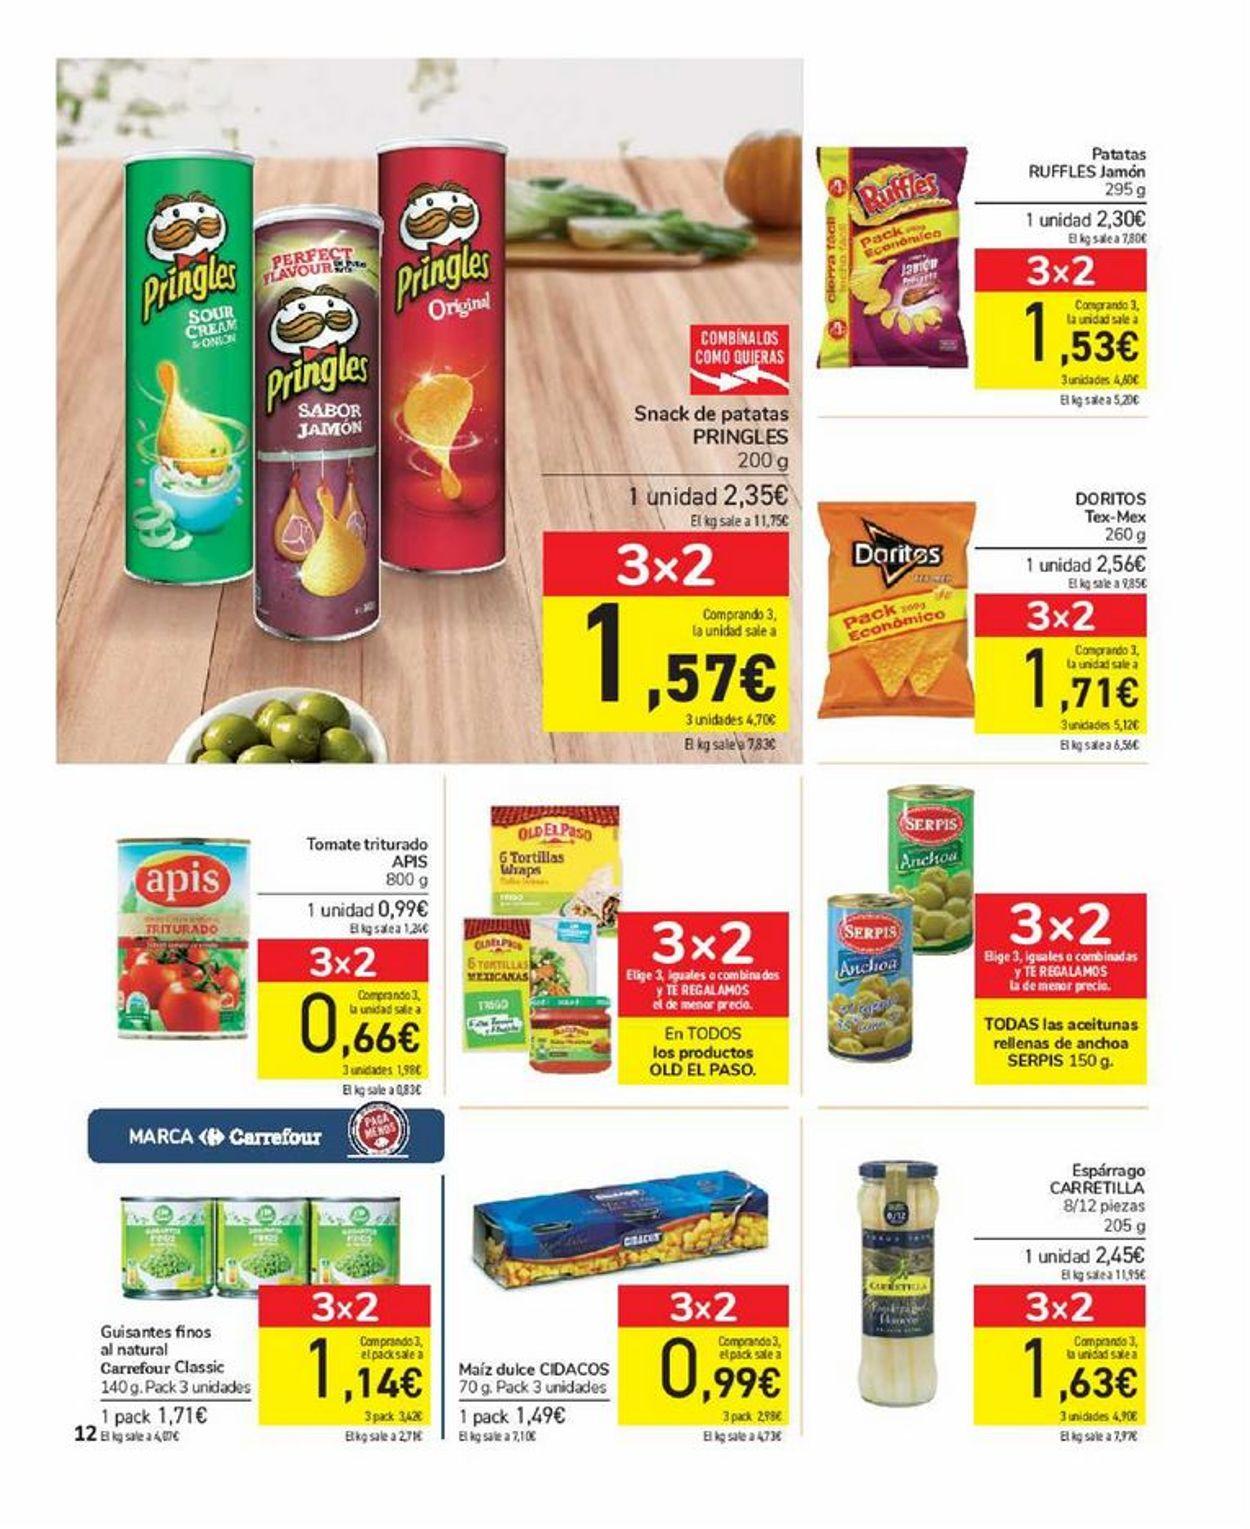 Carrefour Folleto - 17.06-29.06.2021 (Página 12)